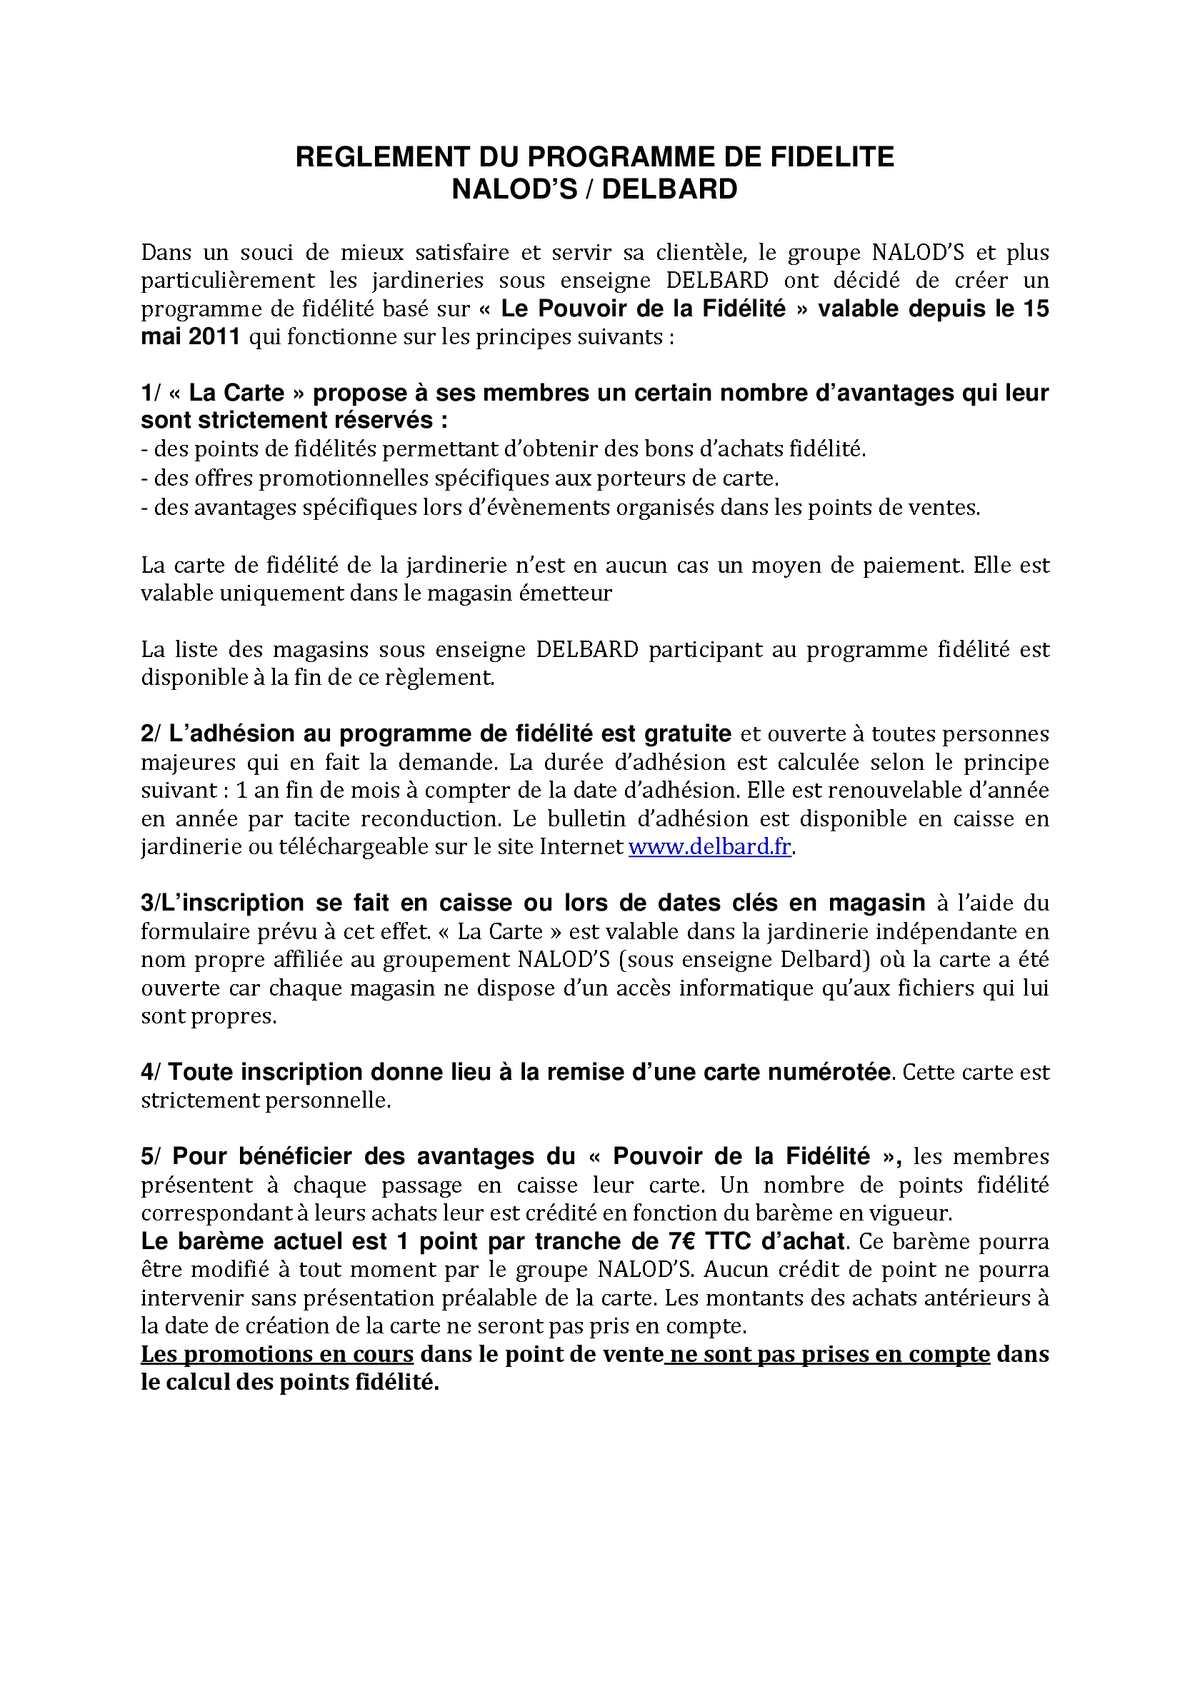 Calameo Reglement Du Programme Fidelite Jardinerie Delbard